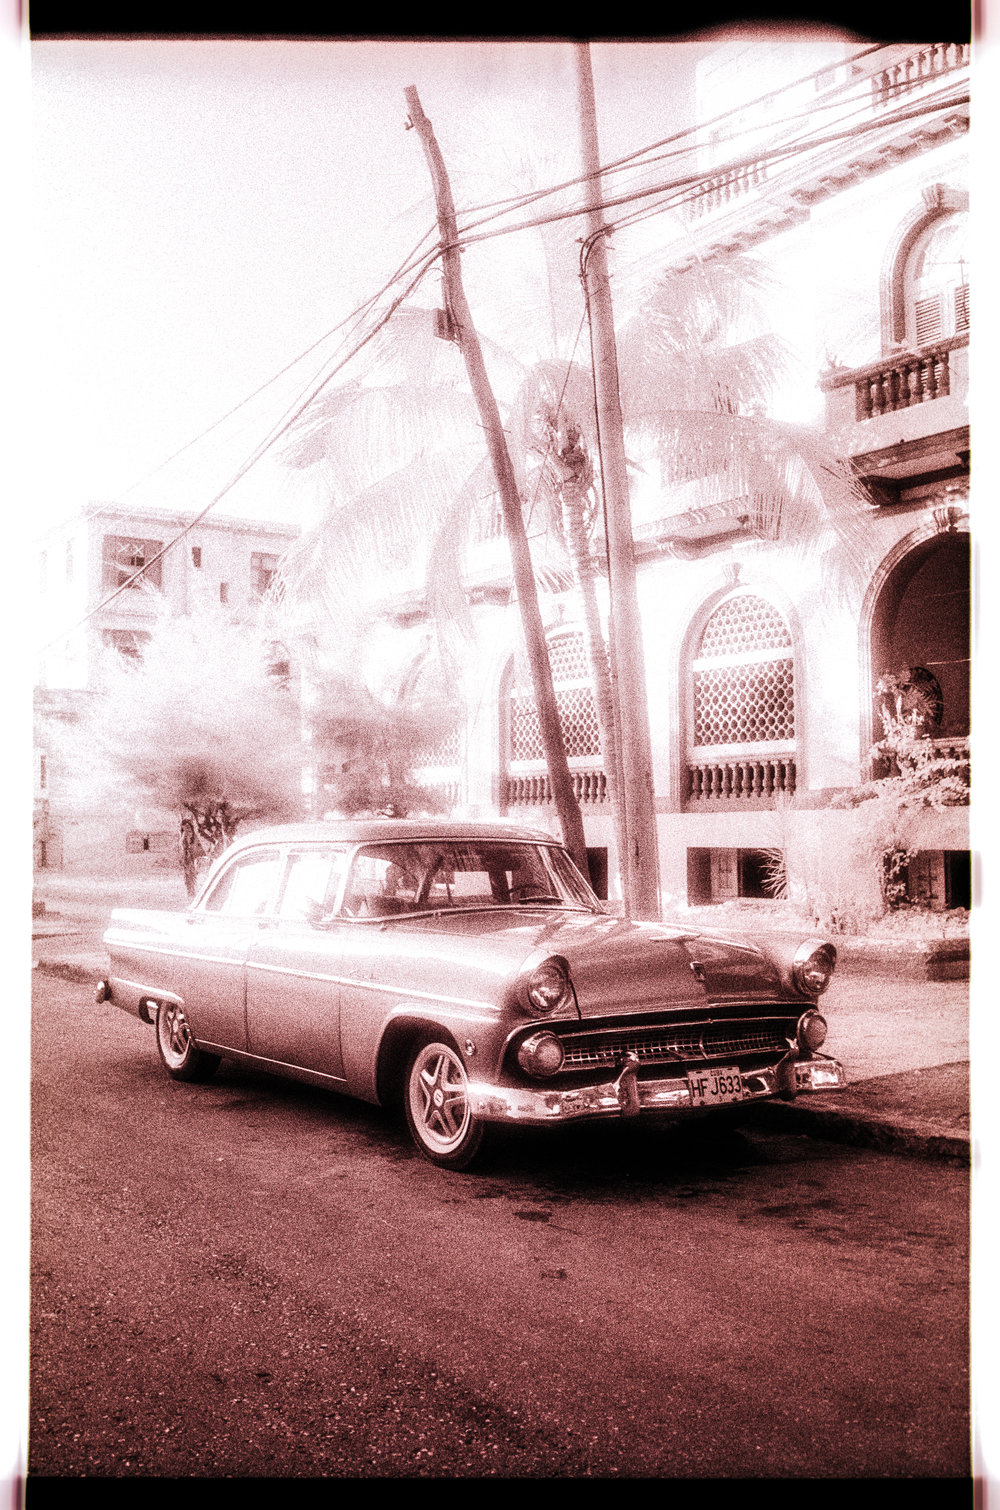 Siesta_Cuba-08.jpg